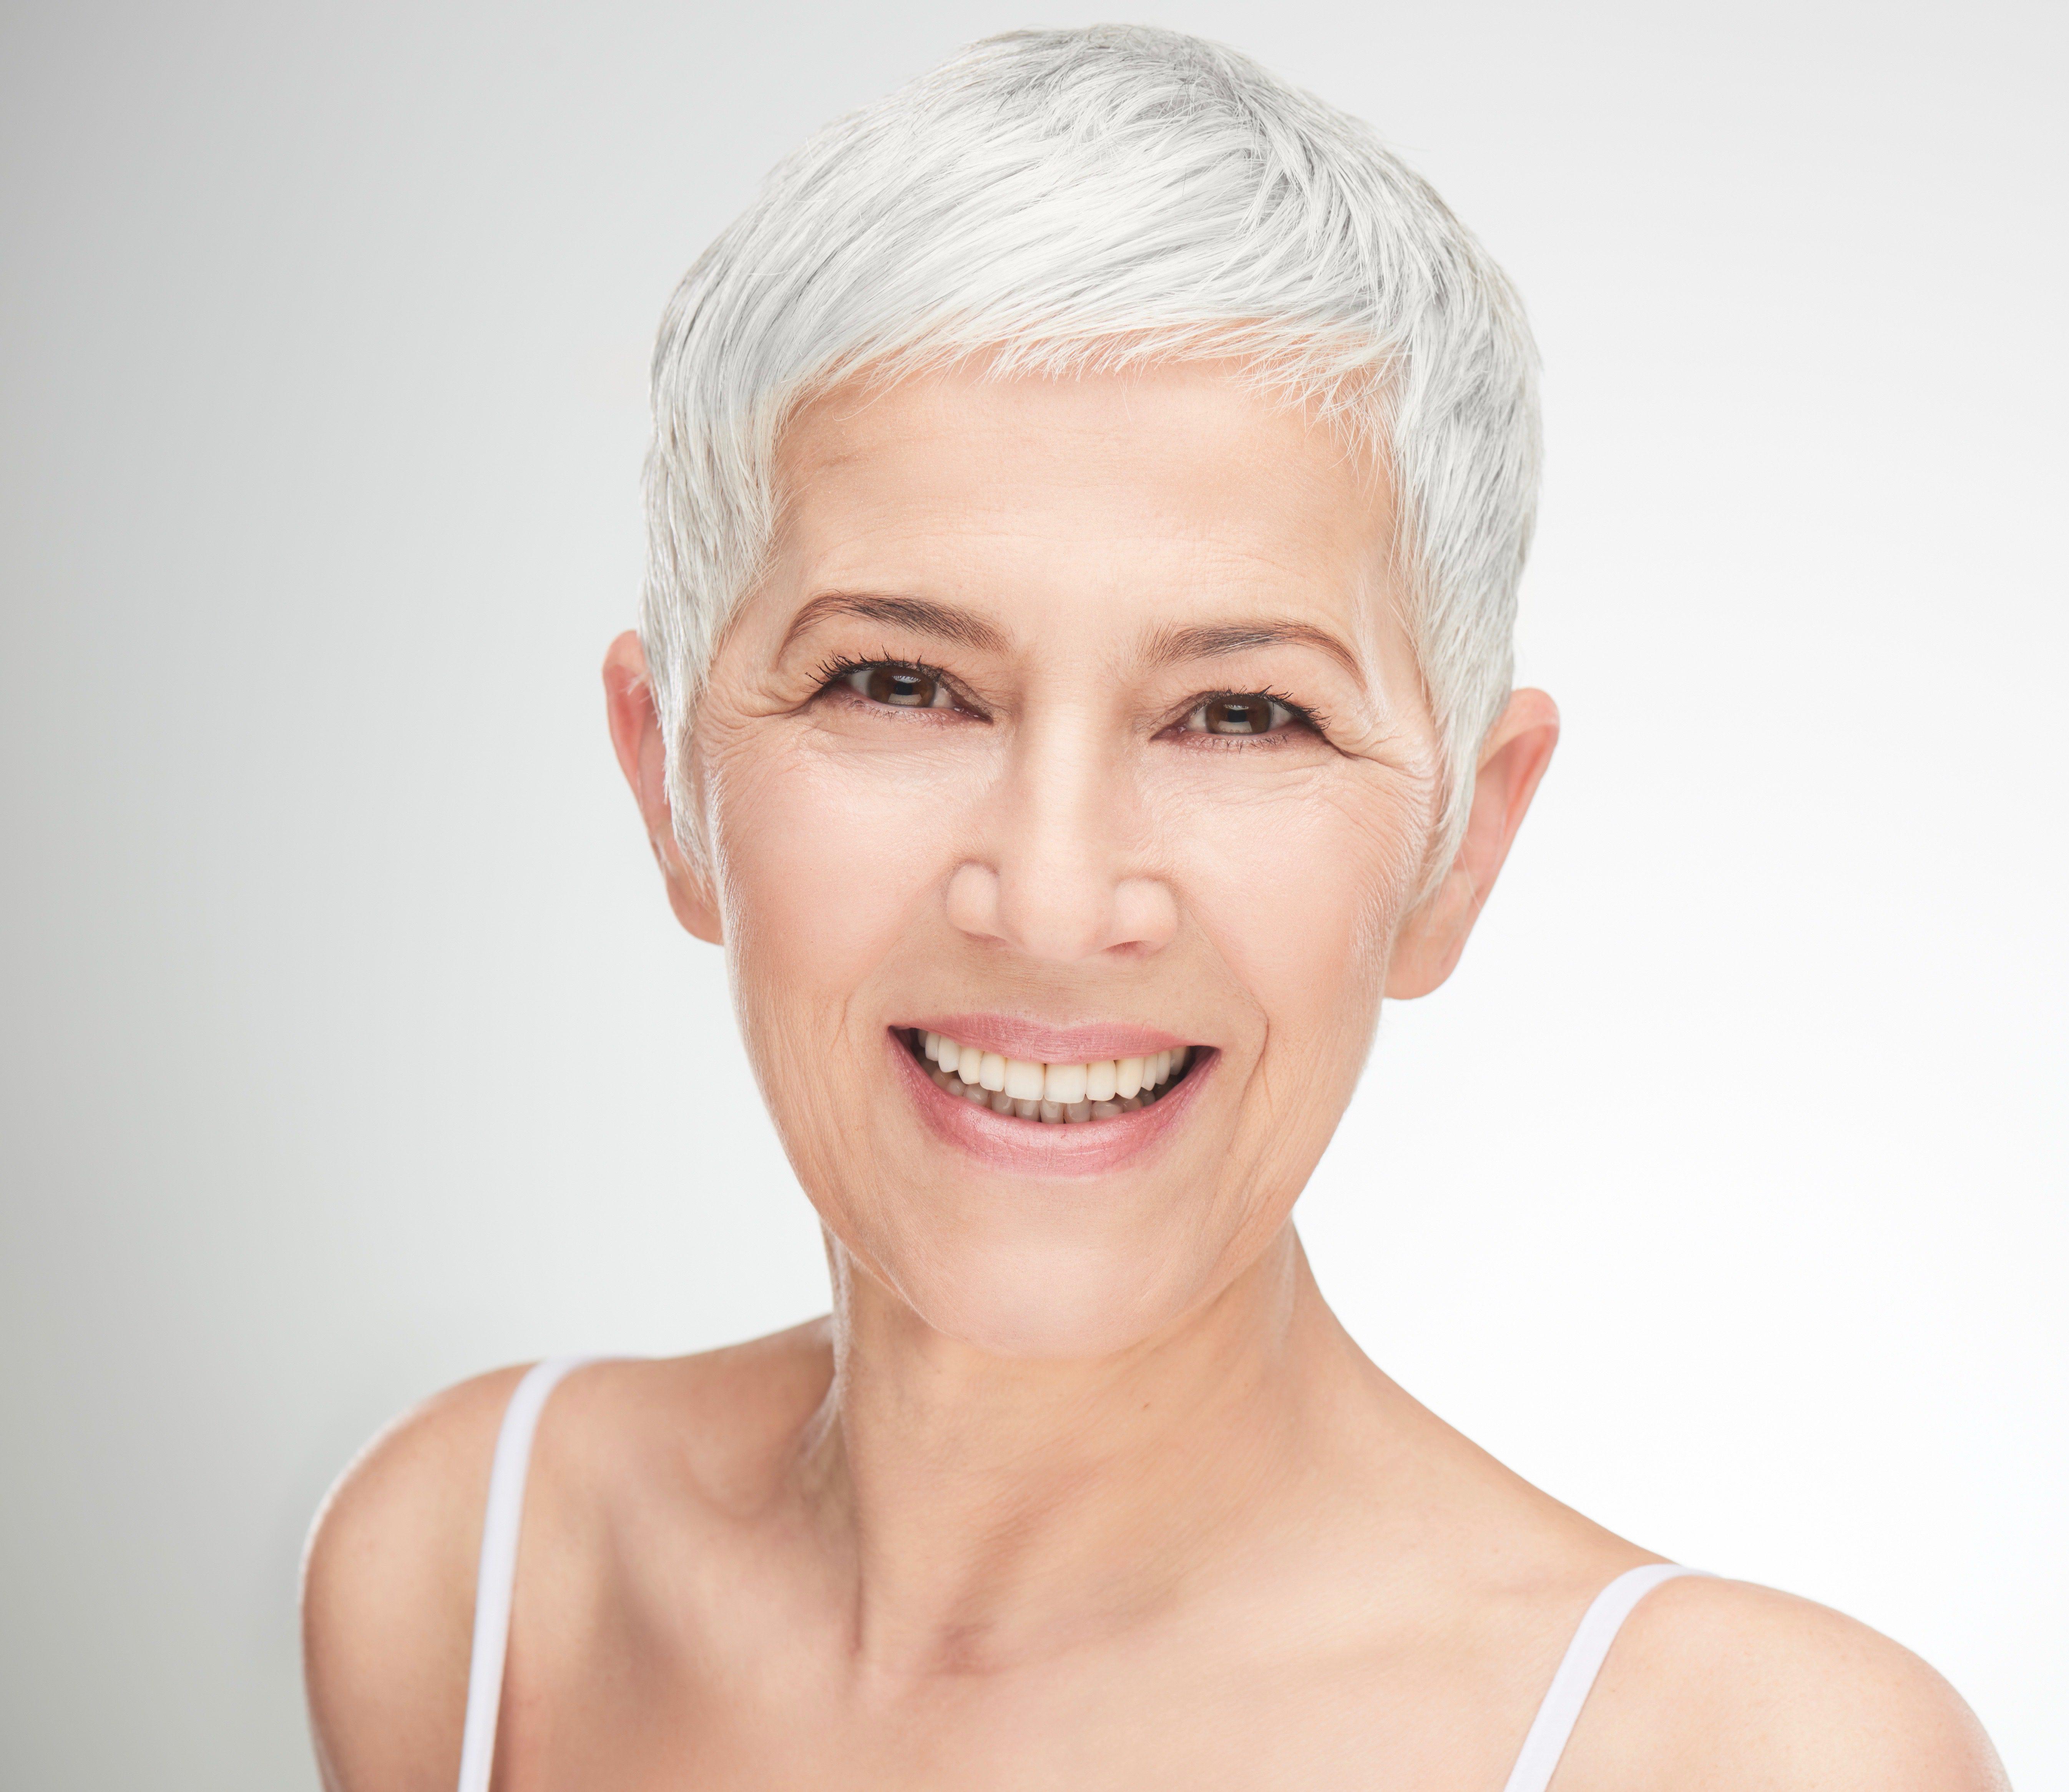 Short Grey Hair Style